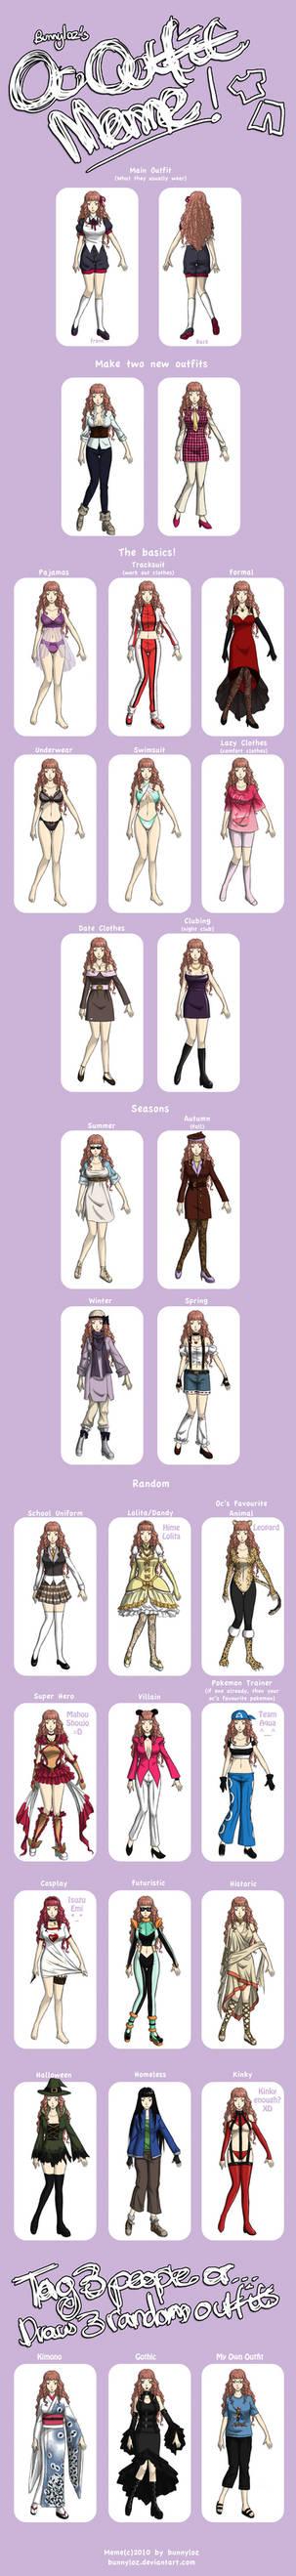 Rensei Outfit Meme